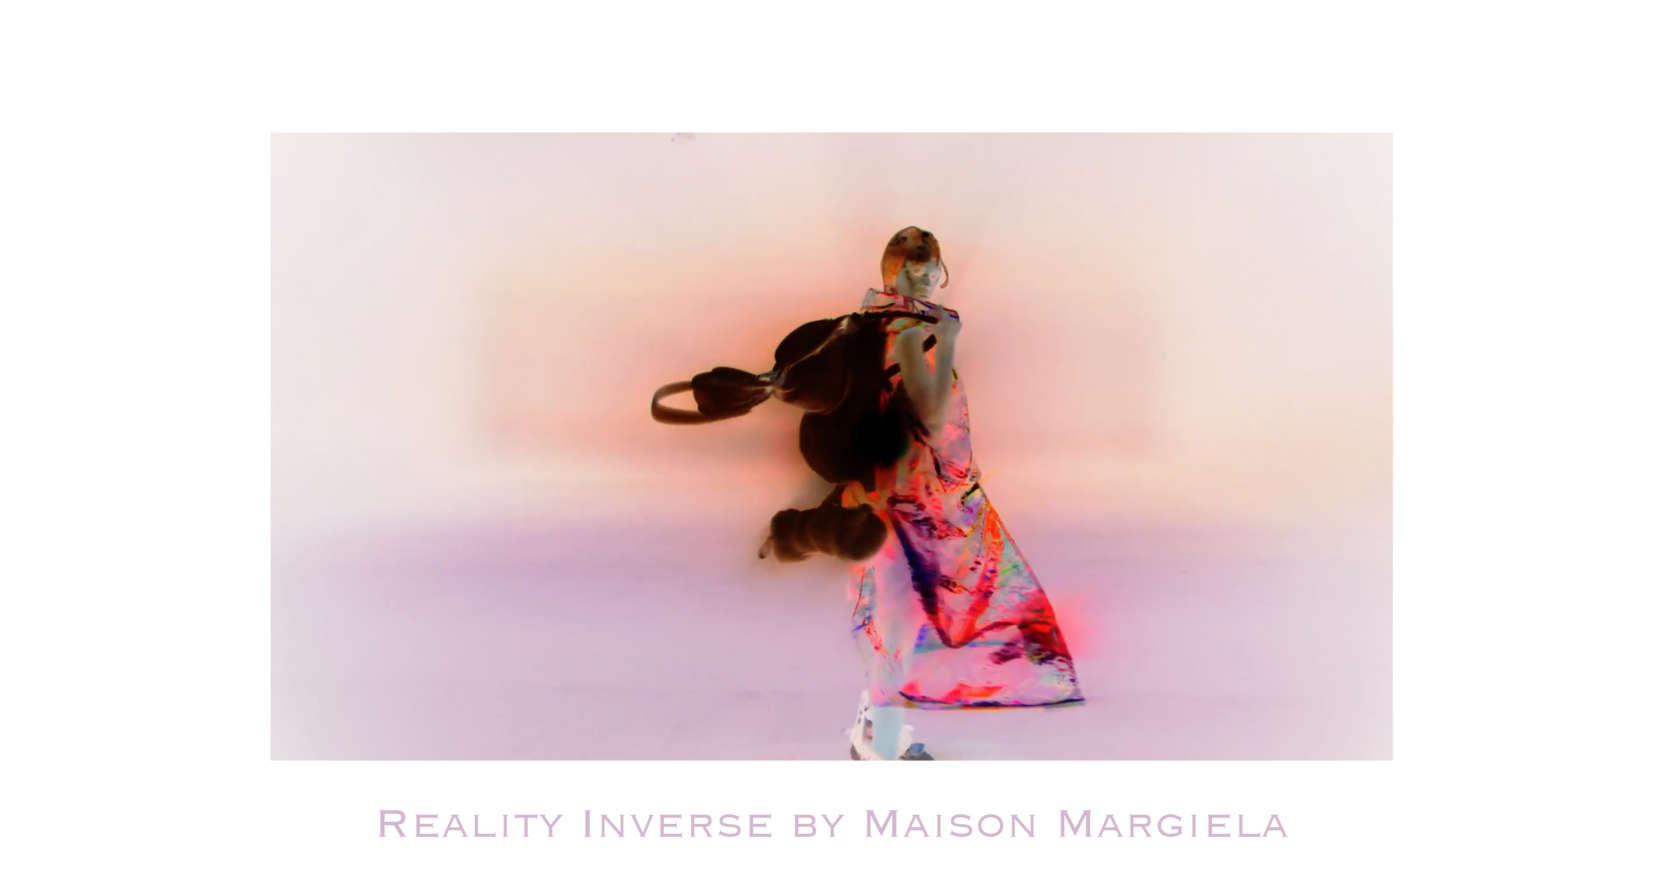 09-Maison-Margiela-title-1660x889.jpg